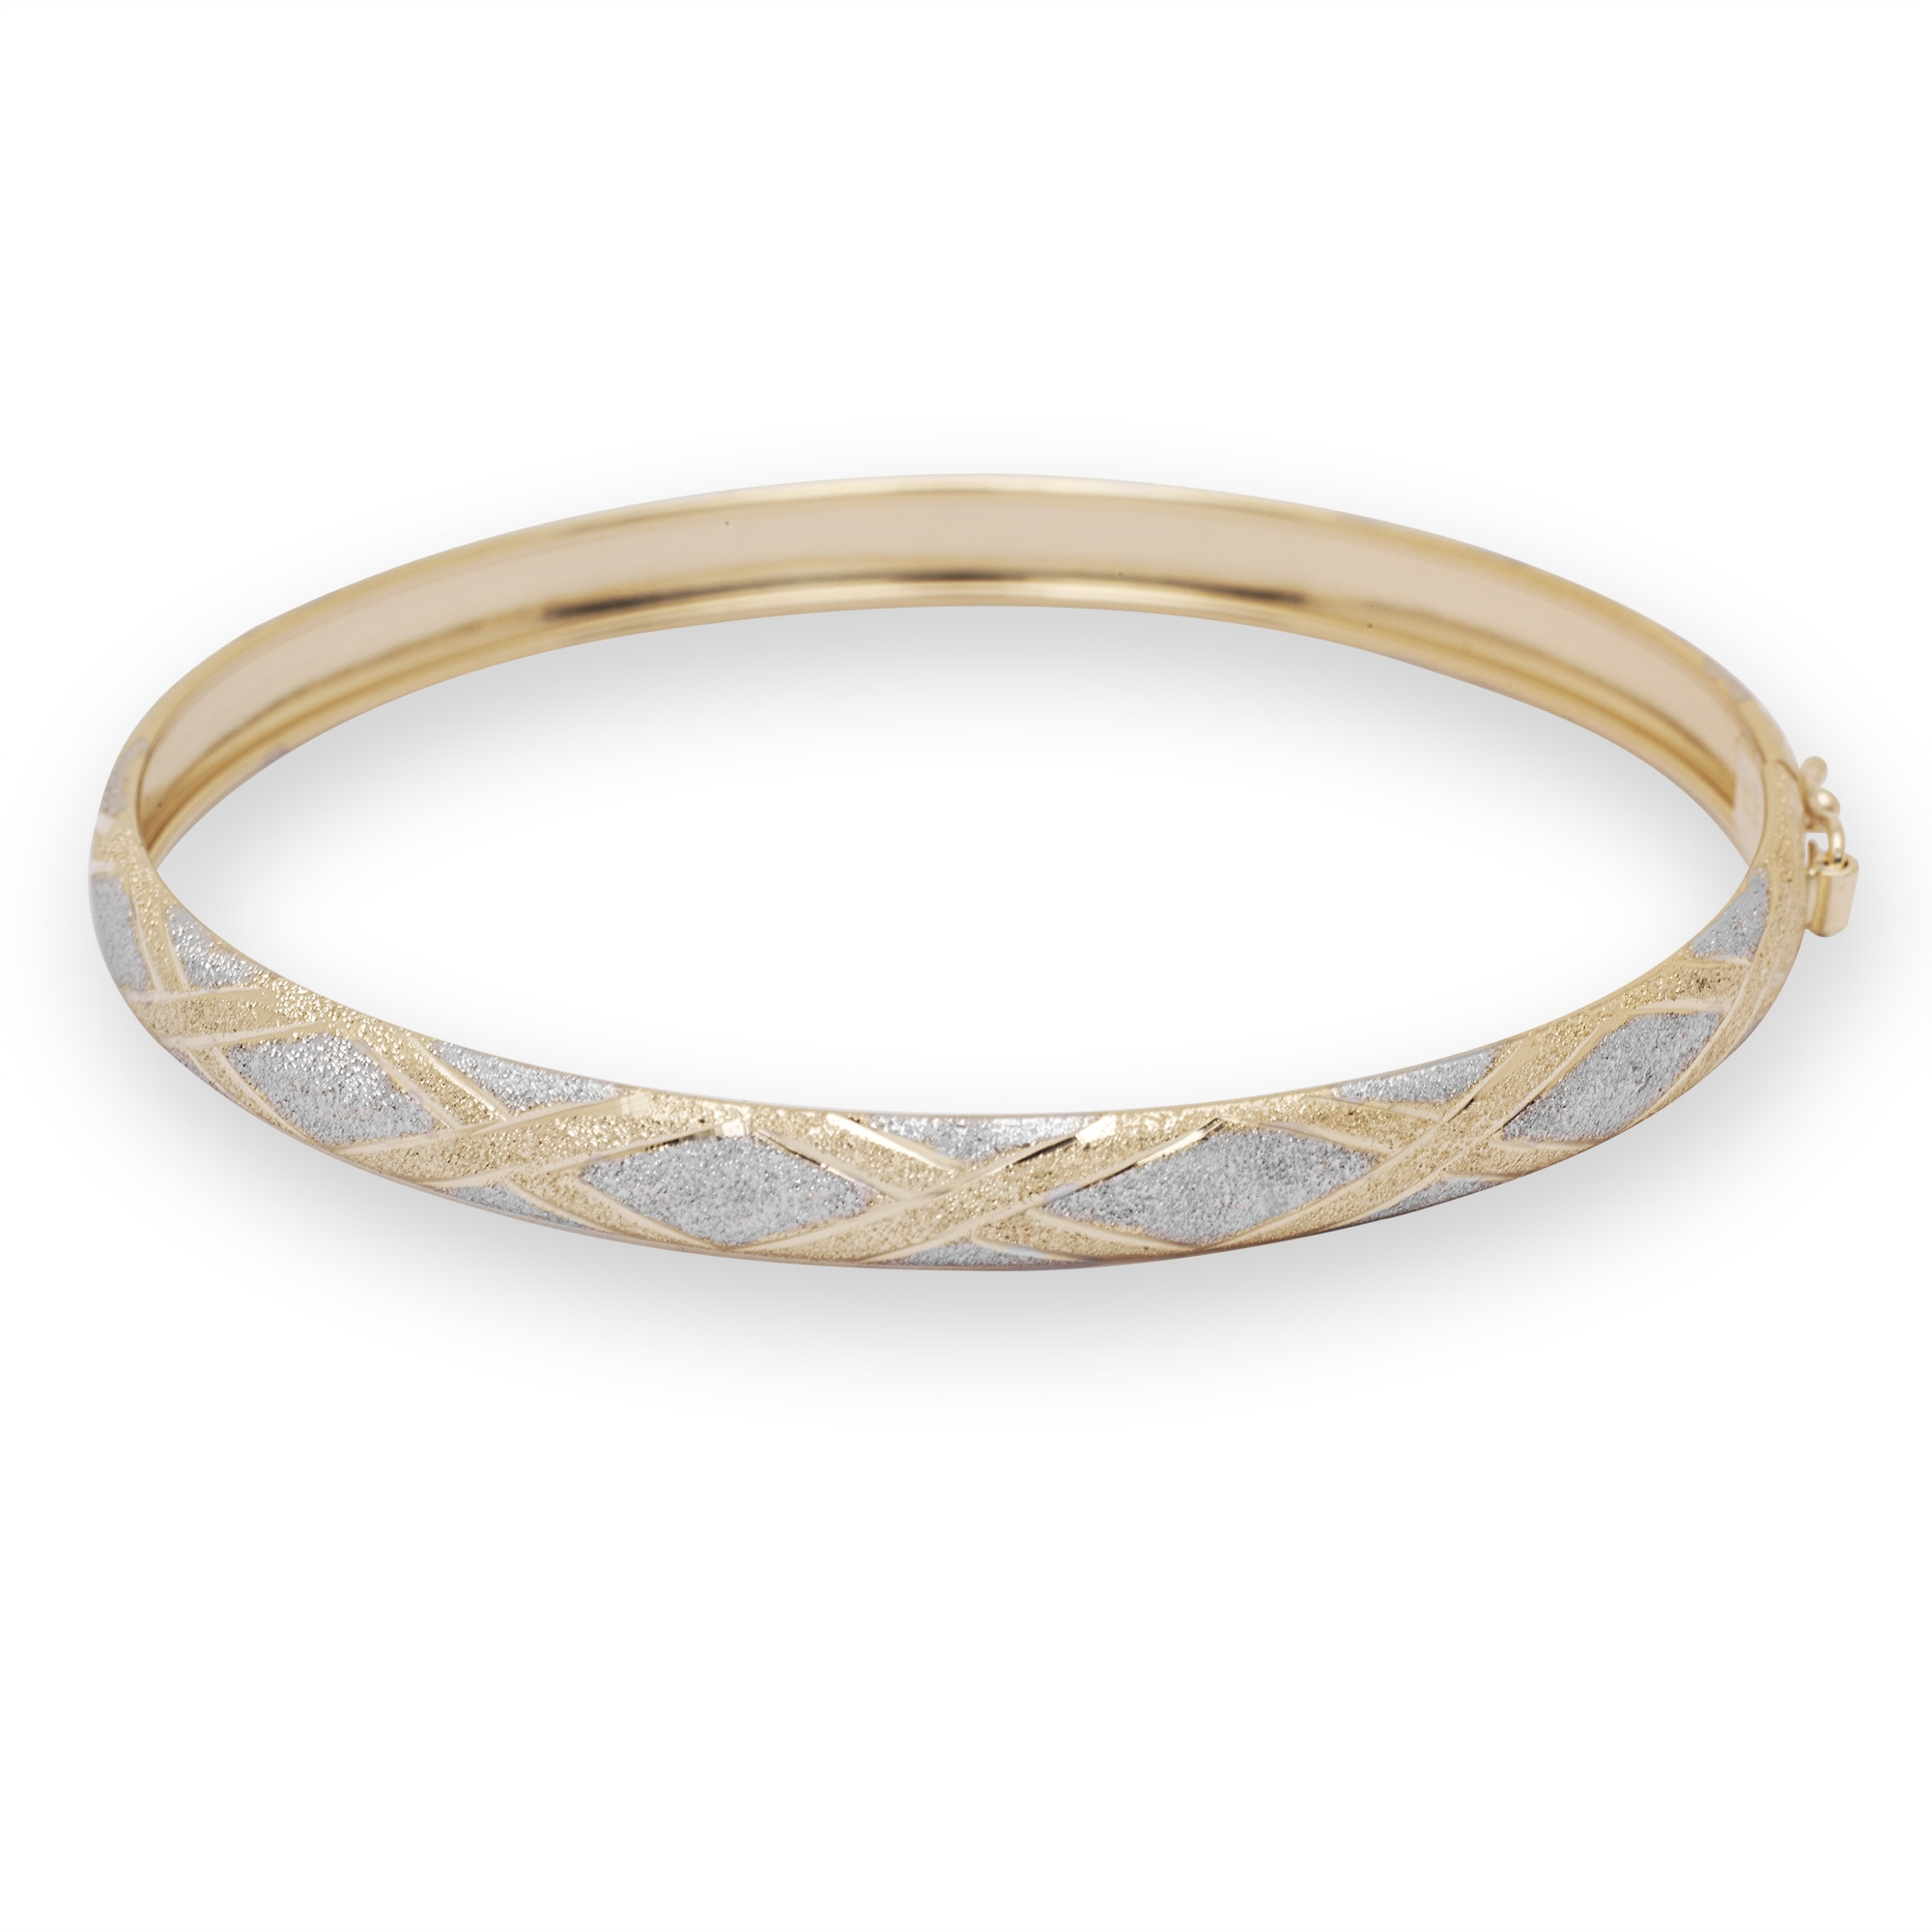 "7/"" or 8/"" Textured X Design Bangle Bracelet Real 10K Yellow White Two-Tone Gold"